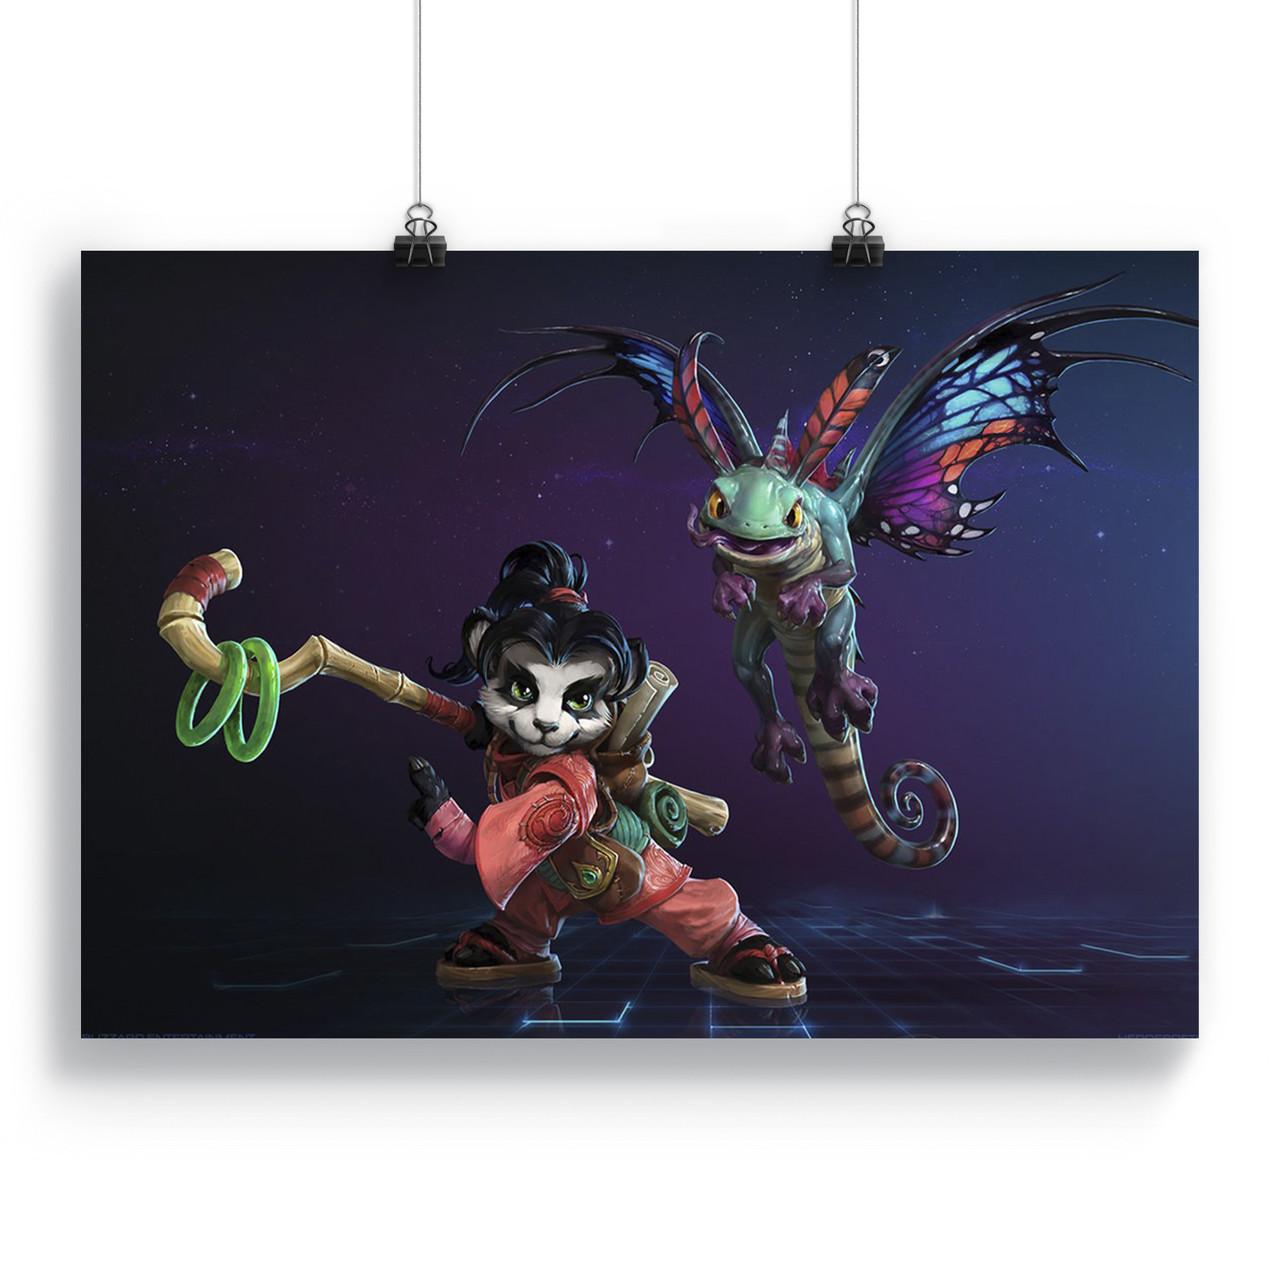 Плакат Герої шторму   Heroes of the Storm 04